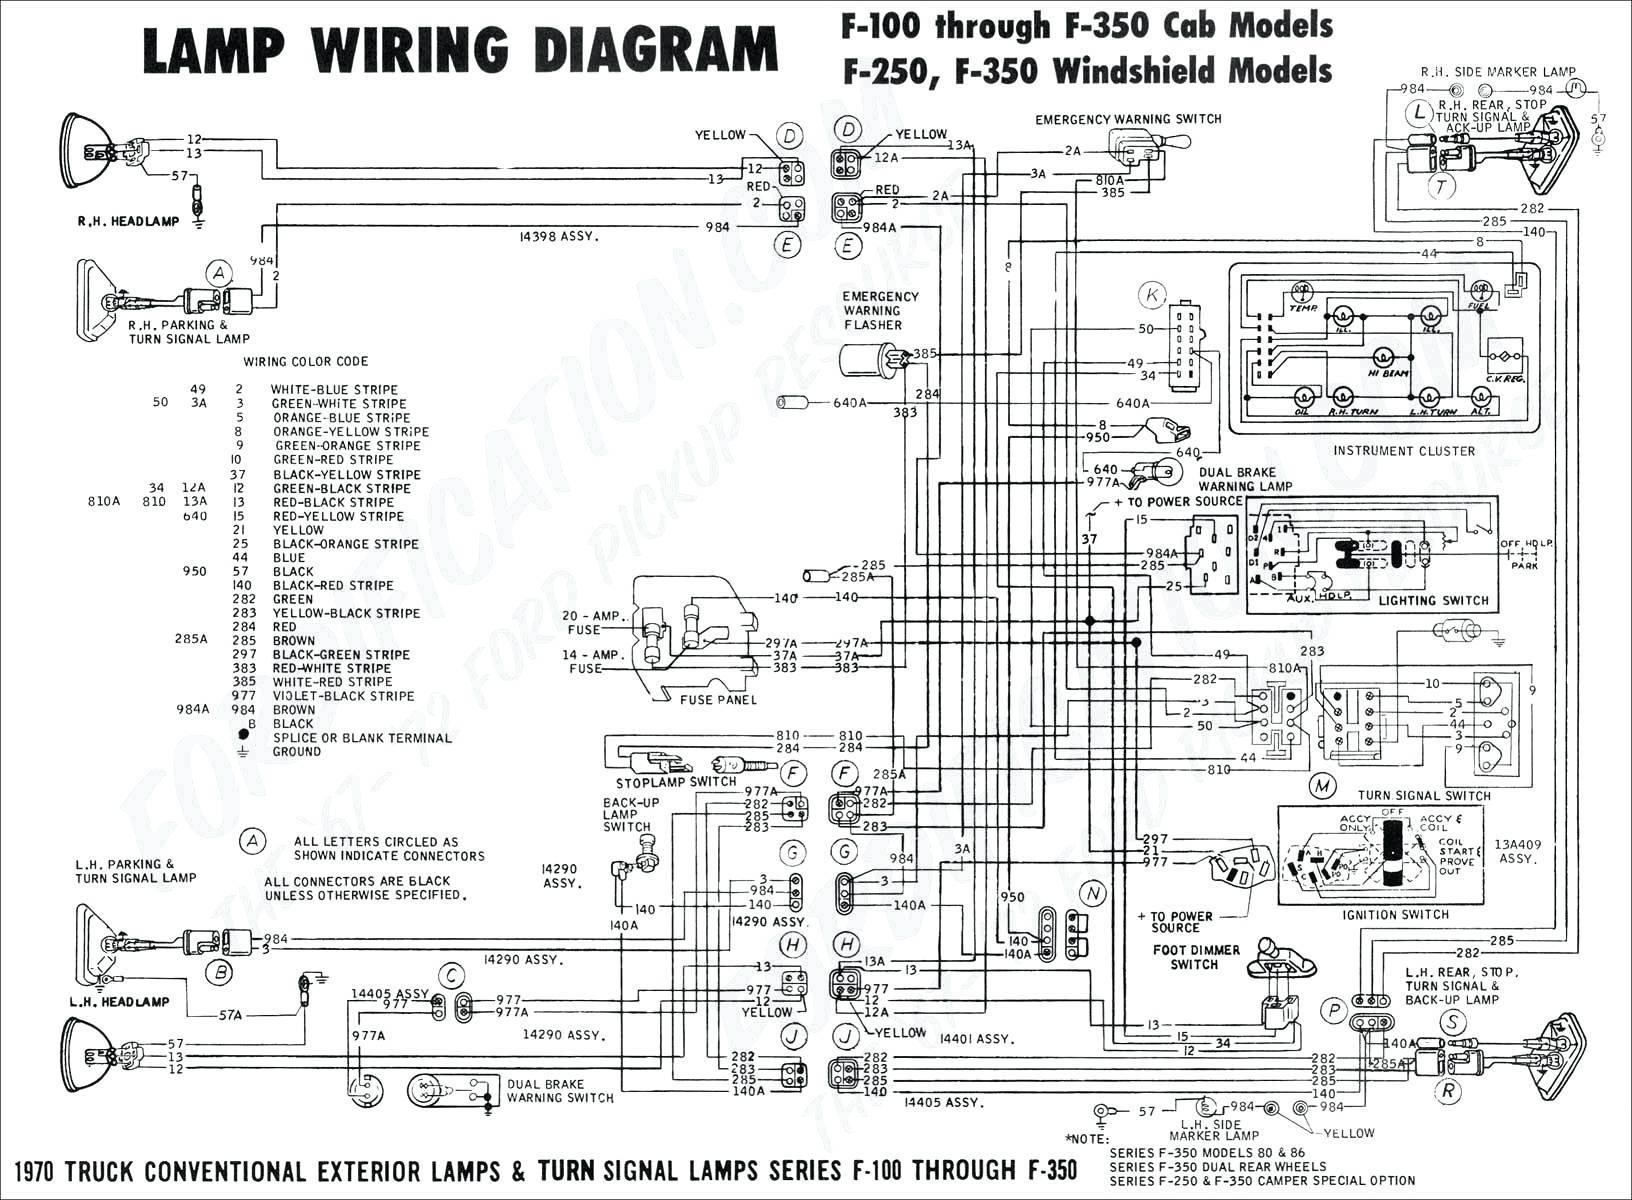 Cadillac Bose Amp Wiring Diagram Book Of Bose Amp Wiring Diagram New - Bose Amp Wiring Diagram